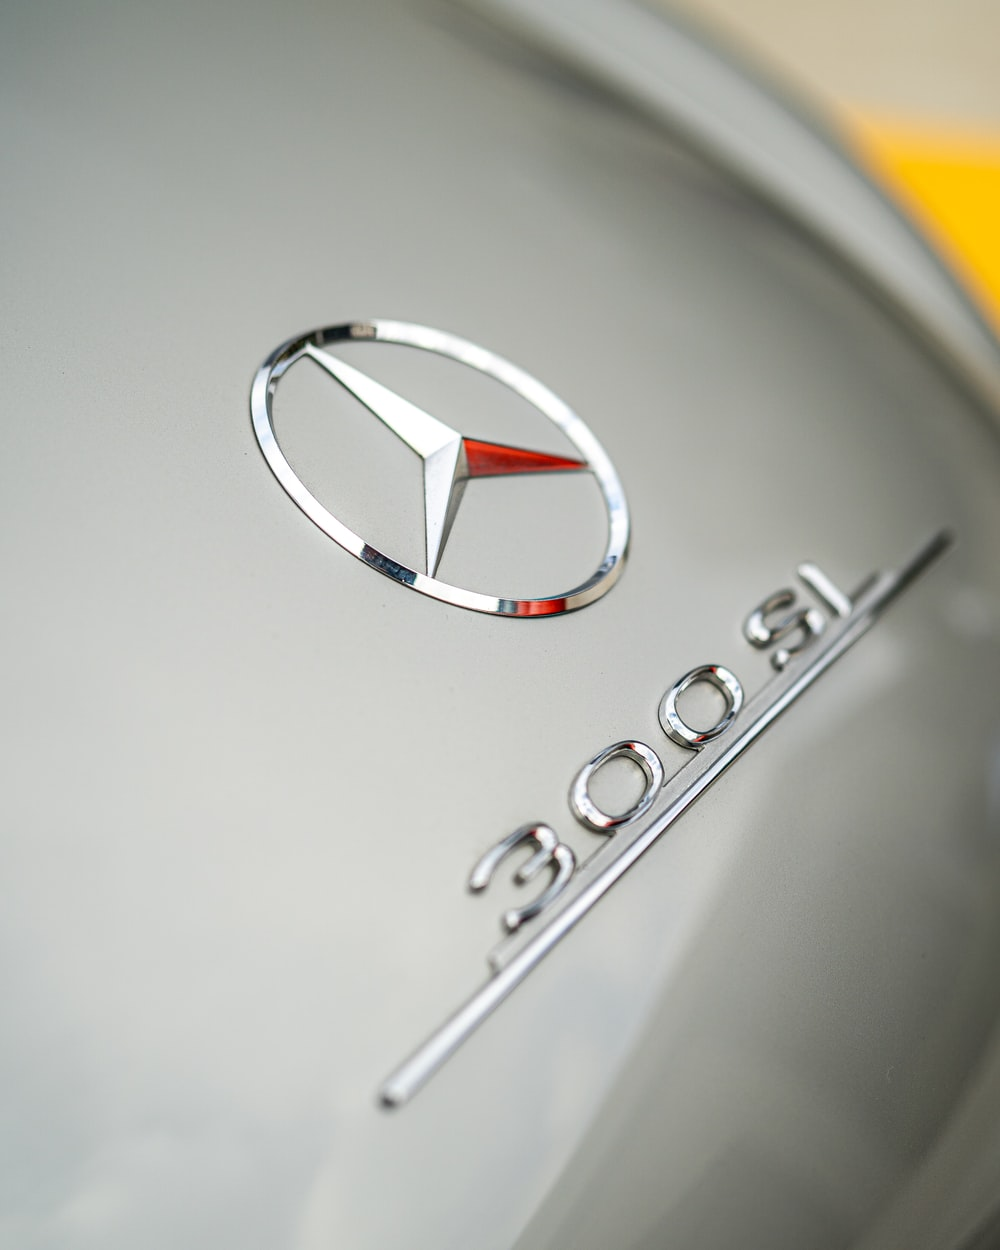 silver mercedes benz emblem on white surface